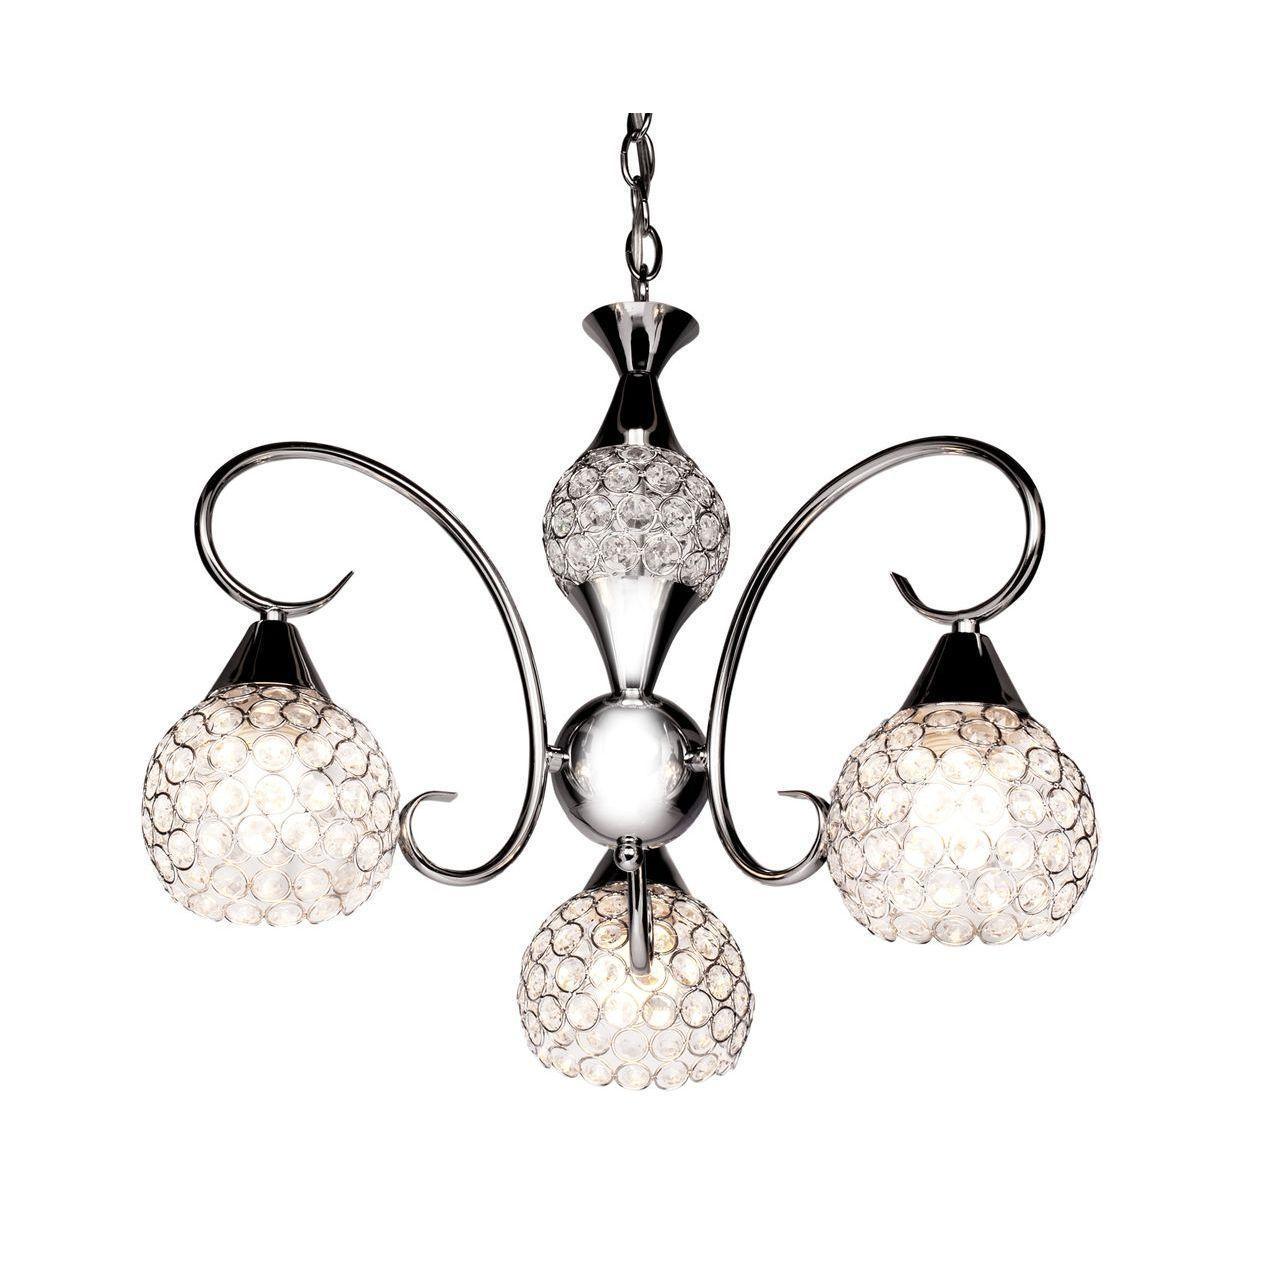 Люстра Silver Light Malika 126.54.3 подвесная подвесная люстра silver light malika 126 54 5